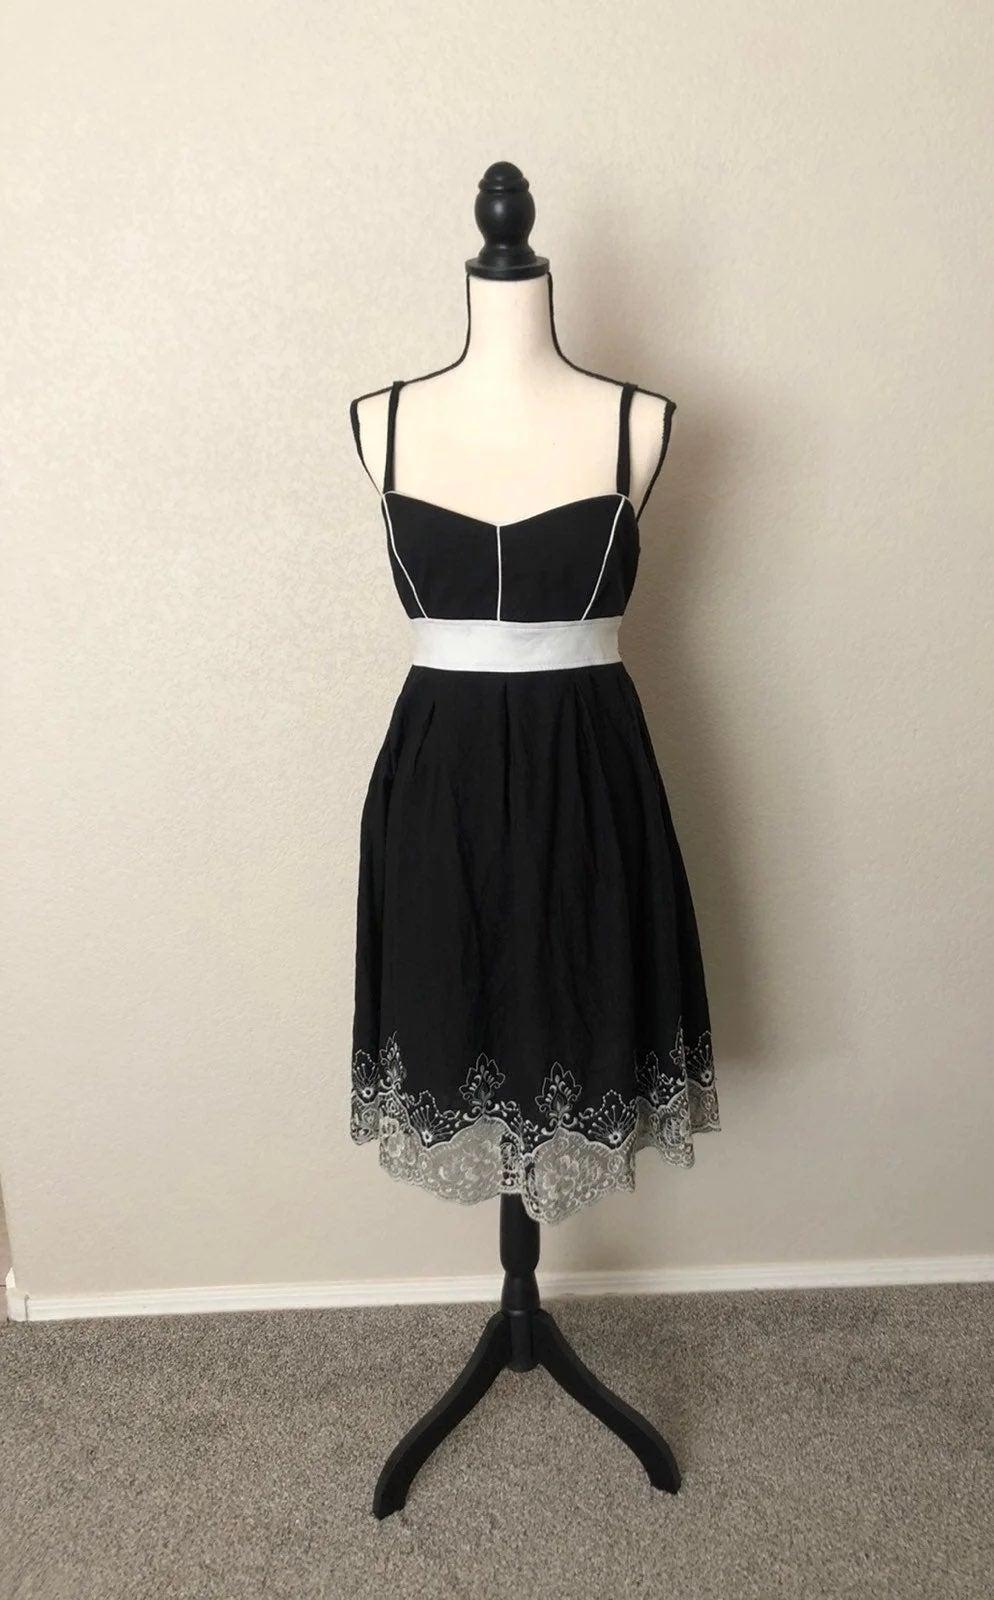 Vintage Style Swing dress w/ Lace Detail